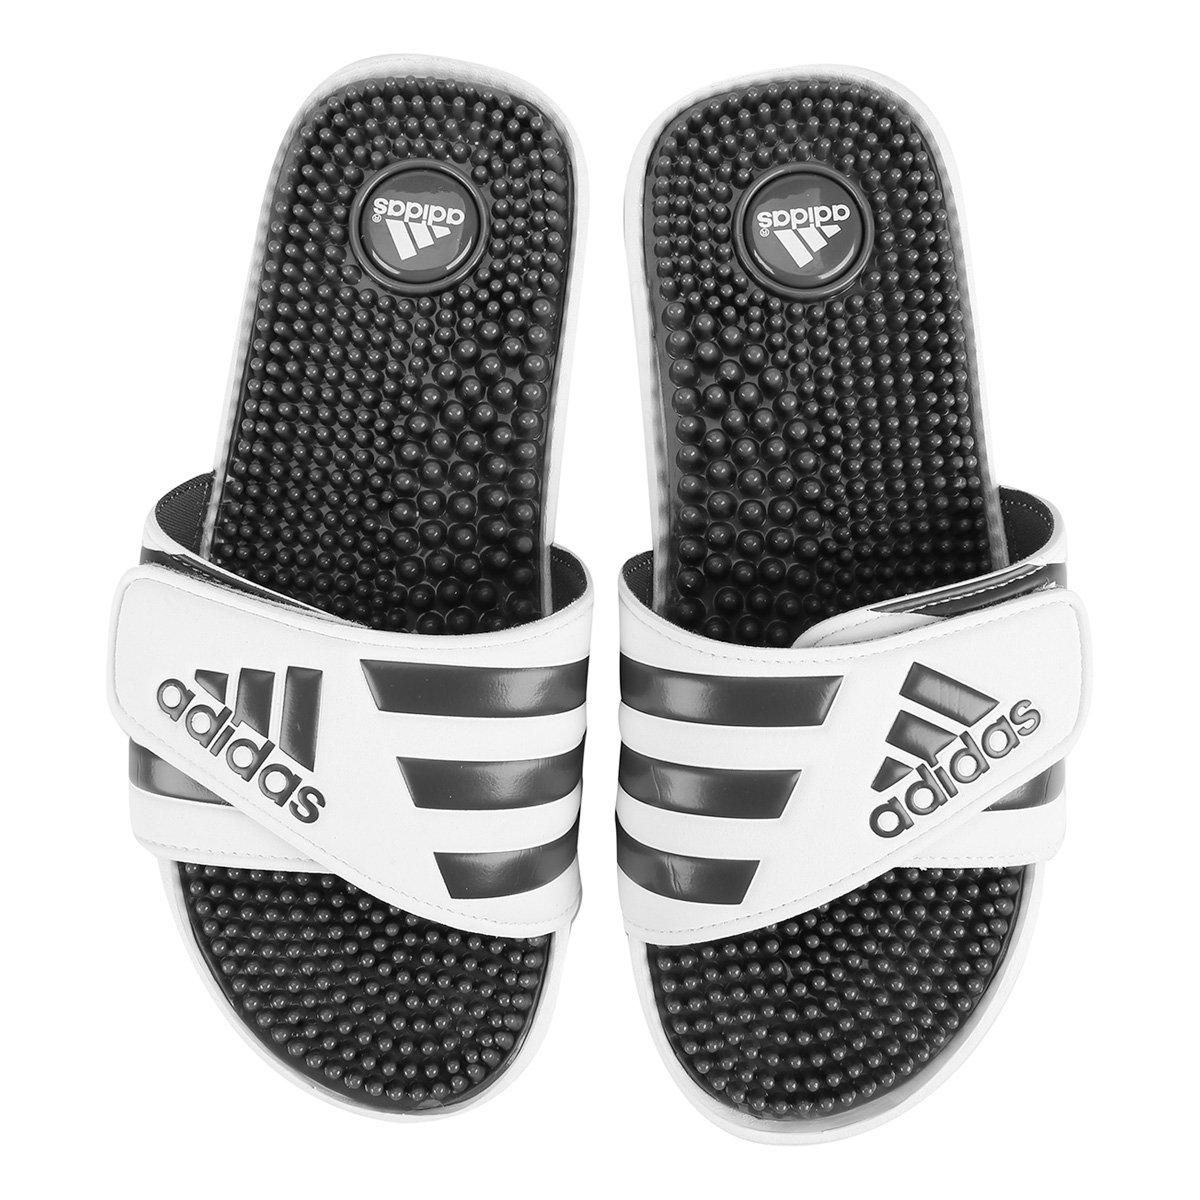 1f3a05e4e Chinelo Adidas Adissage - Compre Agora